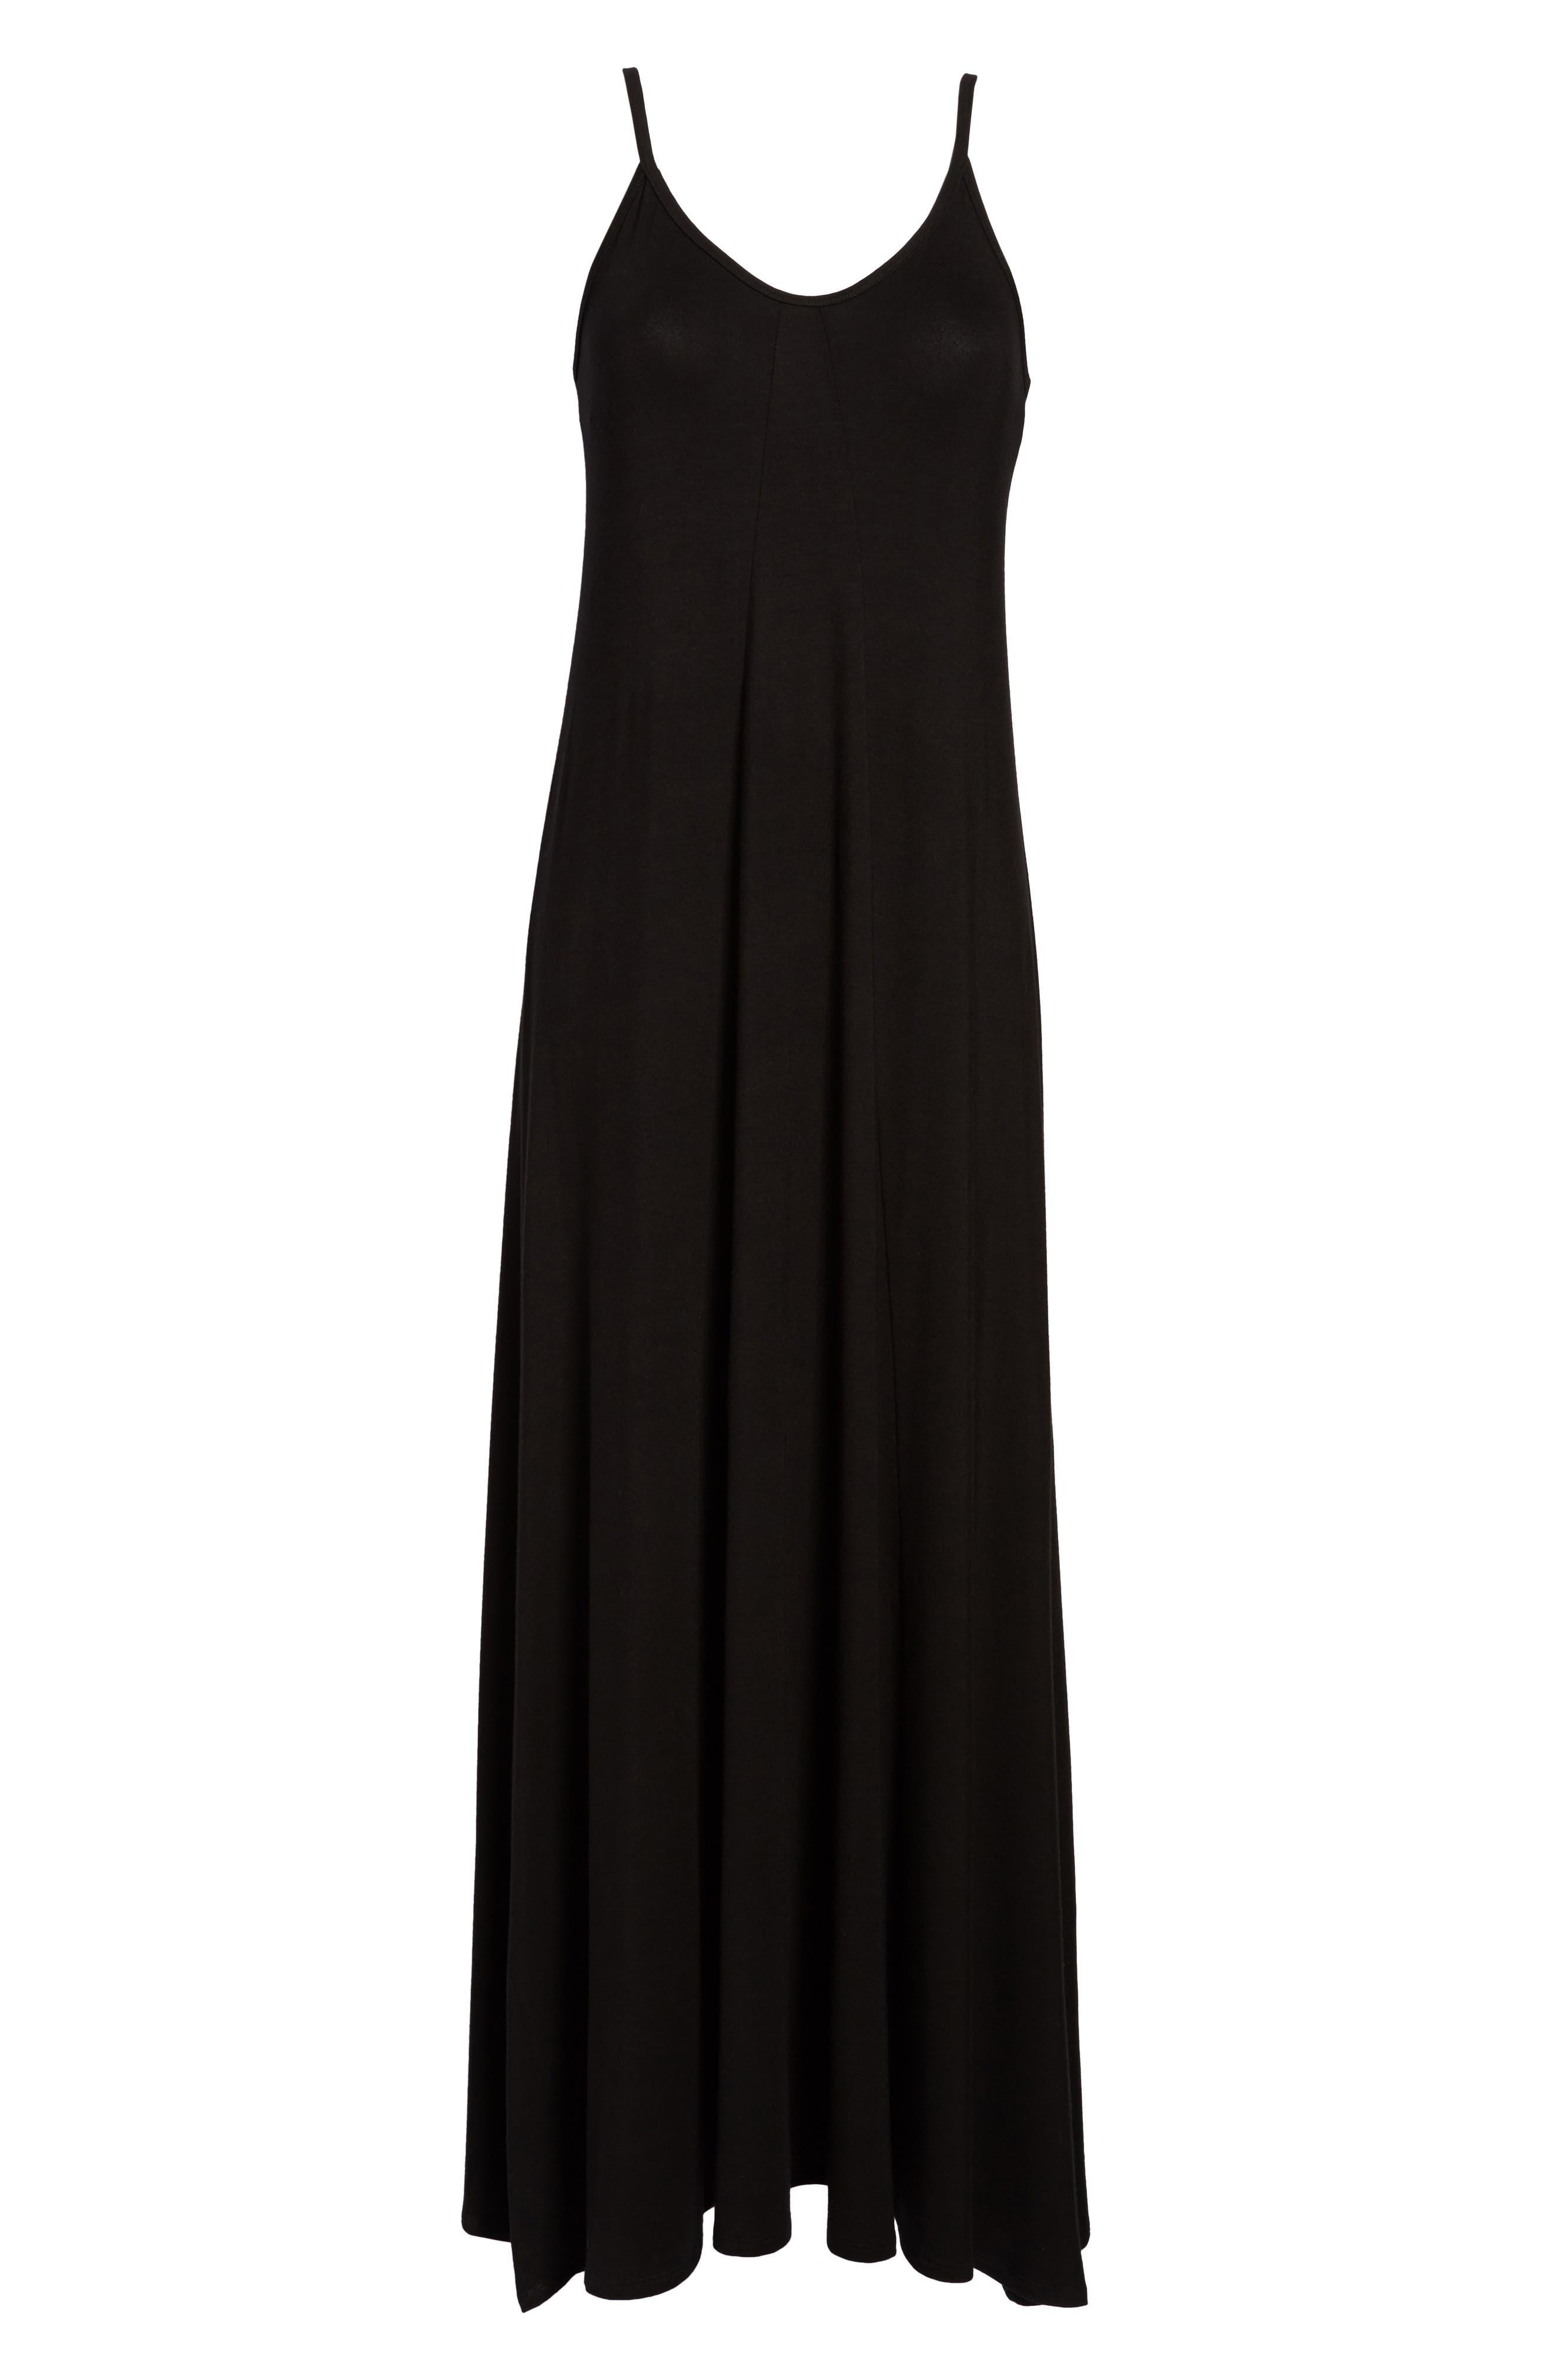 LOVEAPPELLA, Knit Maxi Dress, Alternate thumbnail 8, color, BLACK